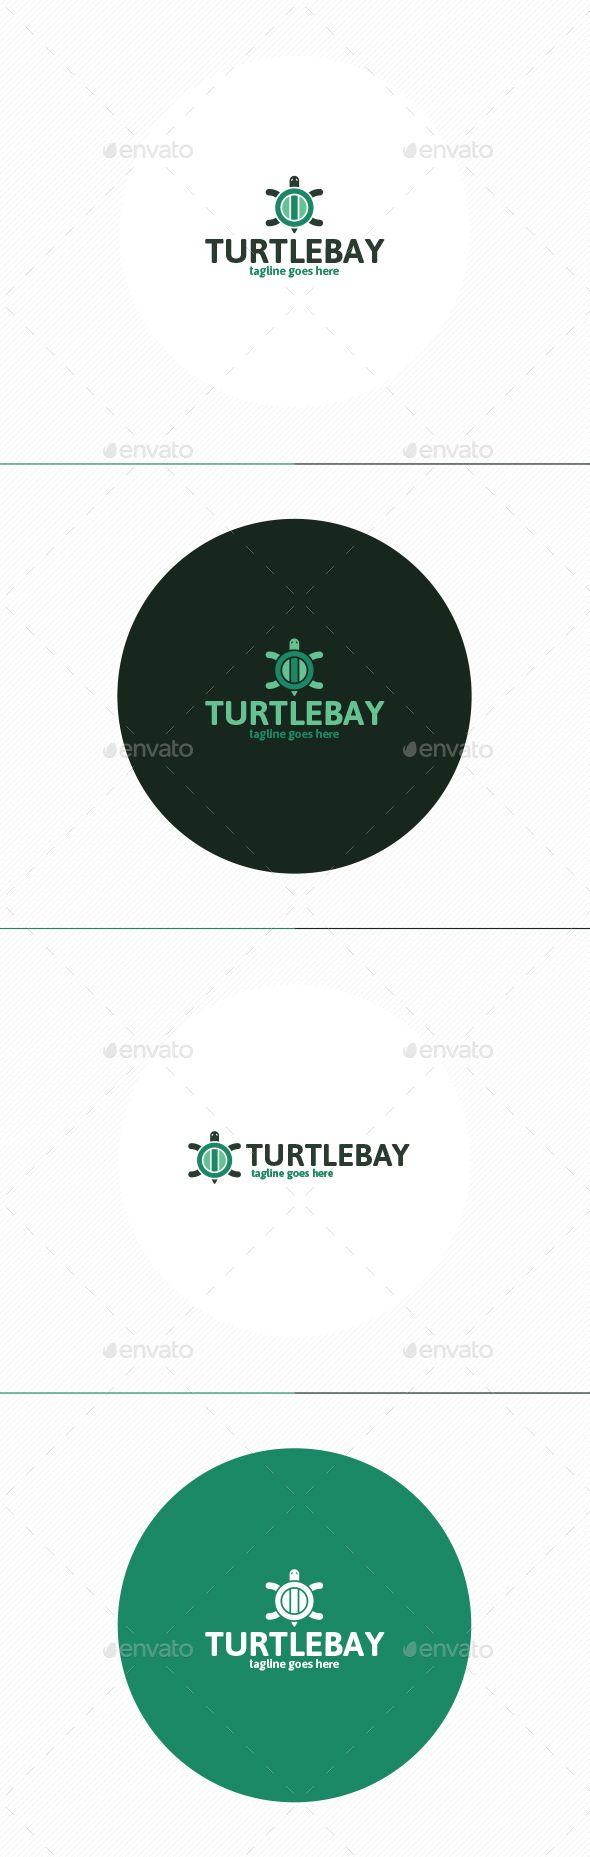 Turtle bay logo turtle bay logos and kids logo turtle bay logo biocorpaavc